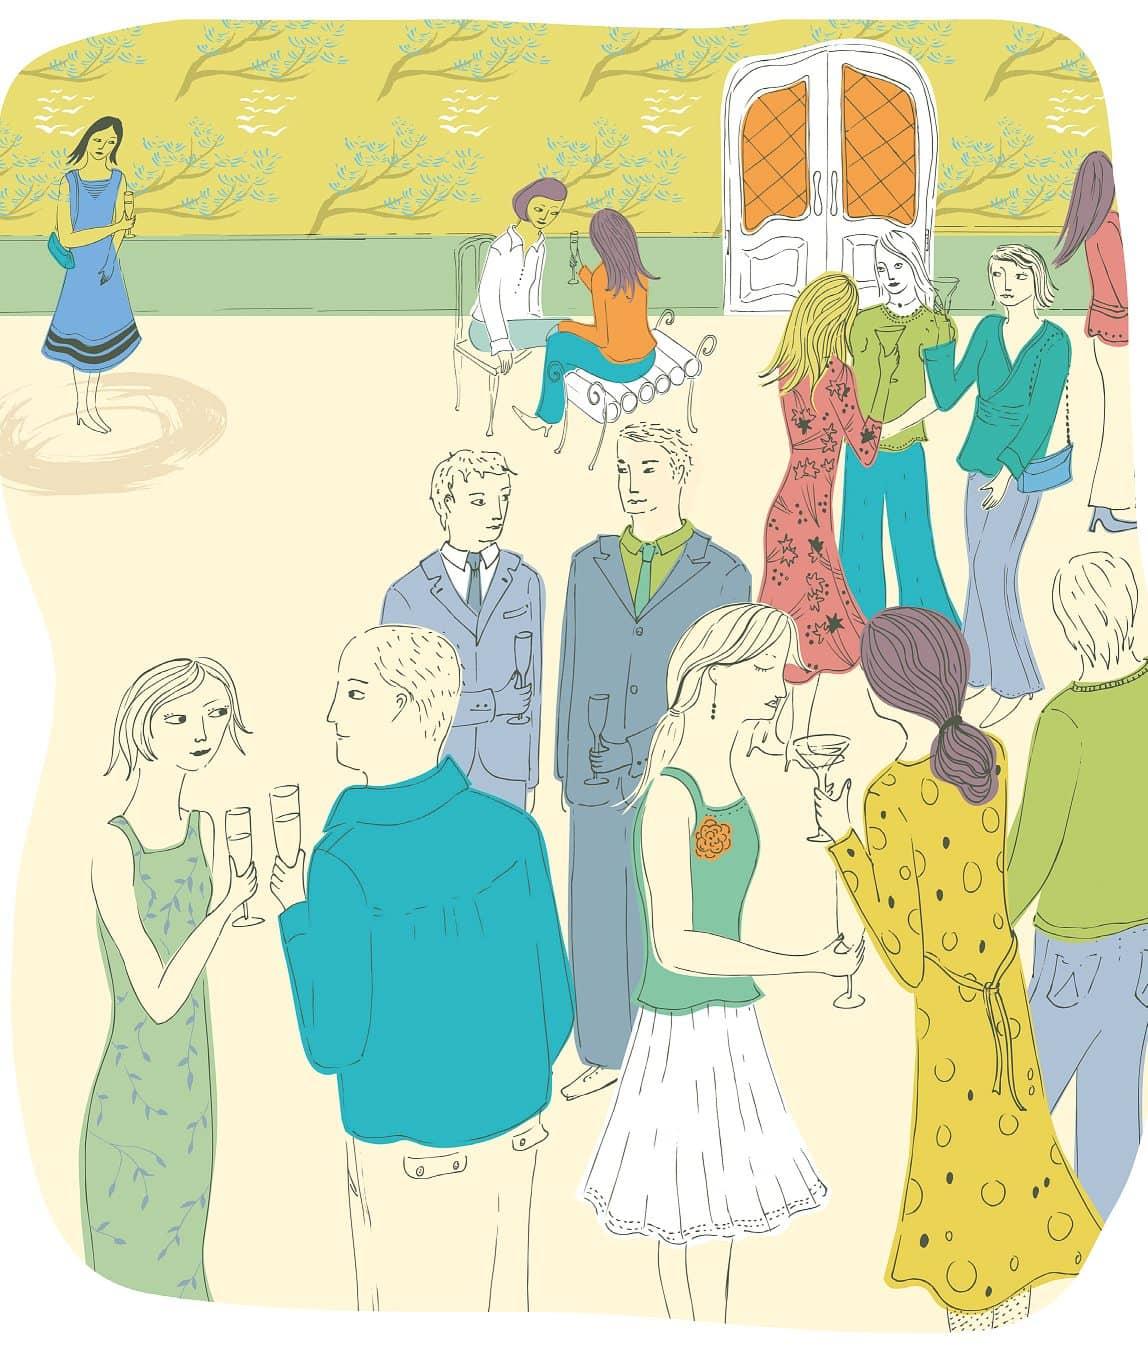 Introverts: Misunderstood Or Misanthropes?